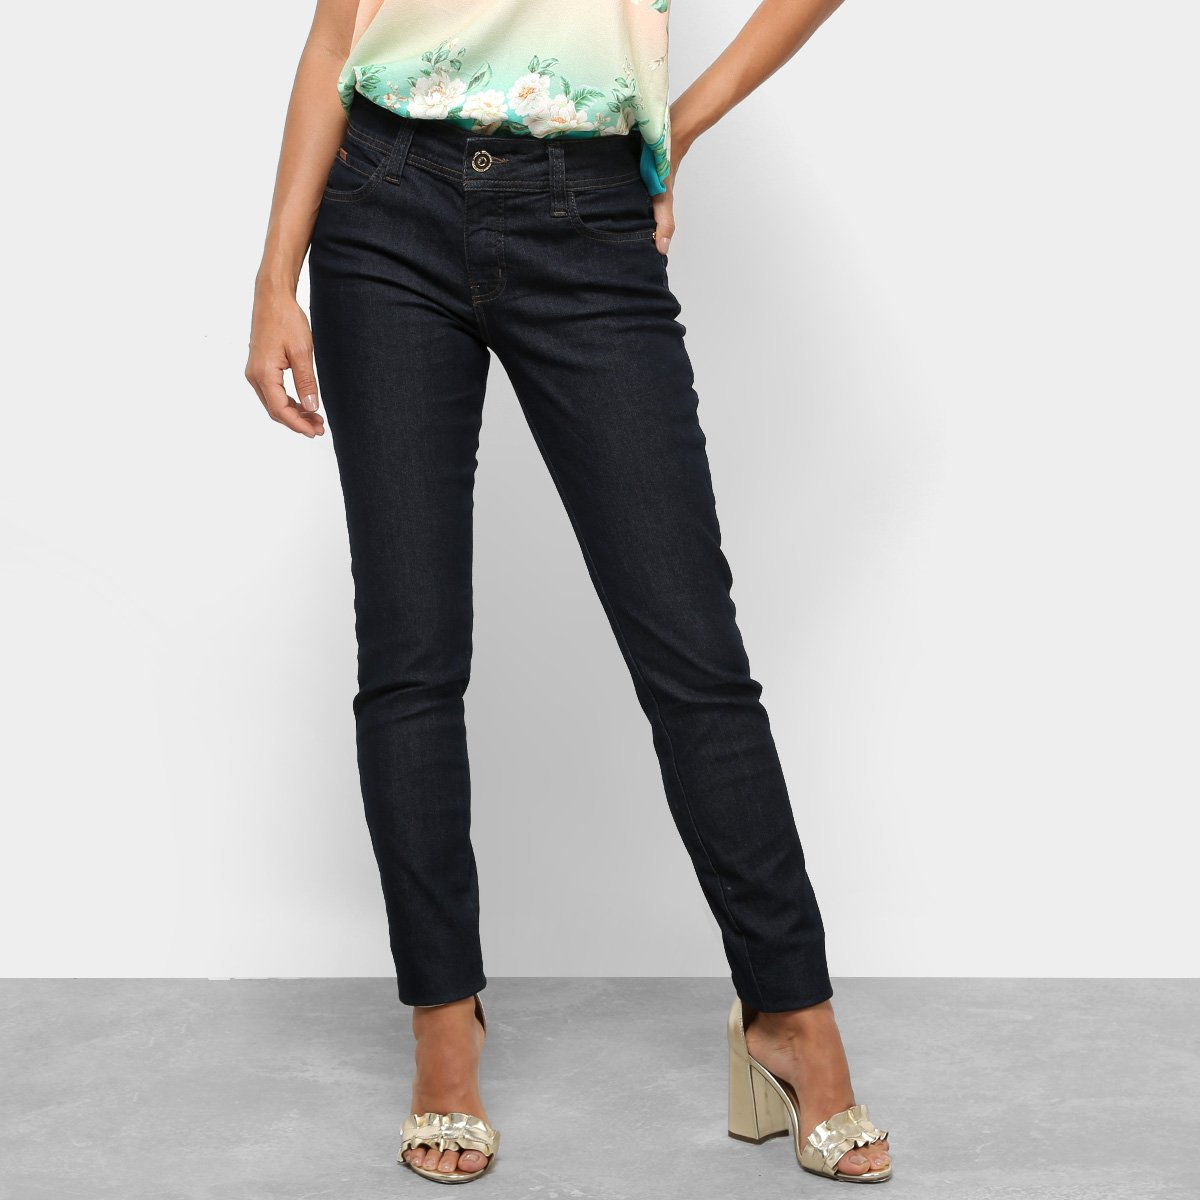 275f5b075 Calça Jeans Skinny Colcci Fátima Lisa Feminina | Netshoes